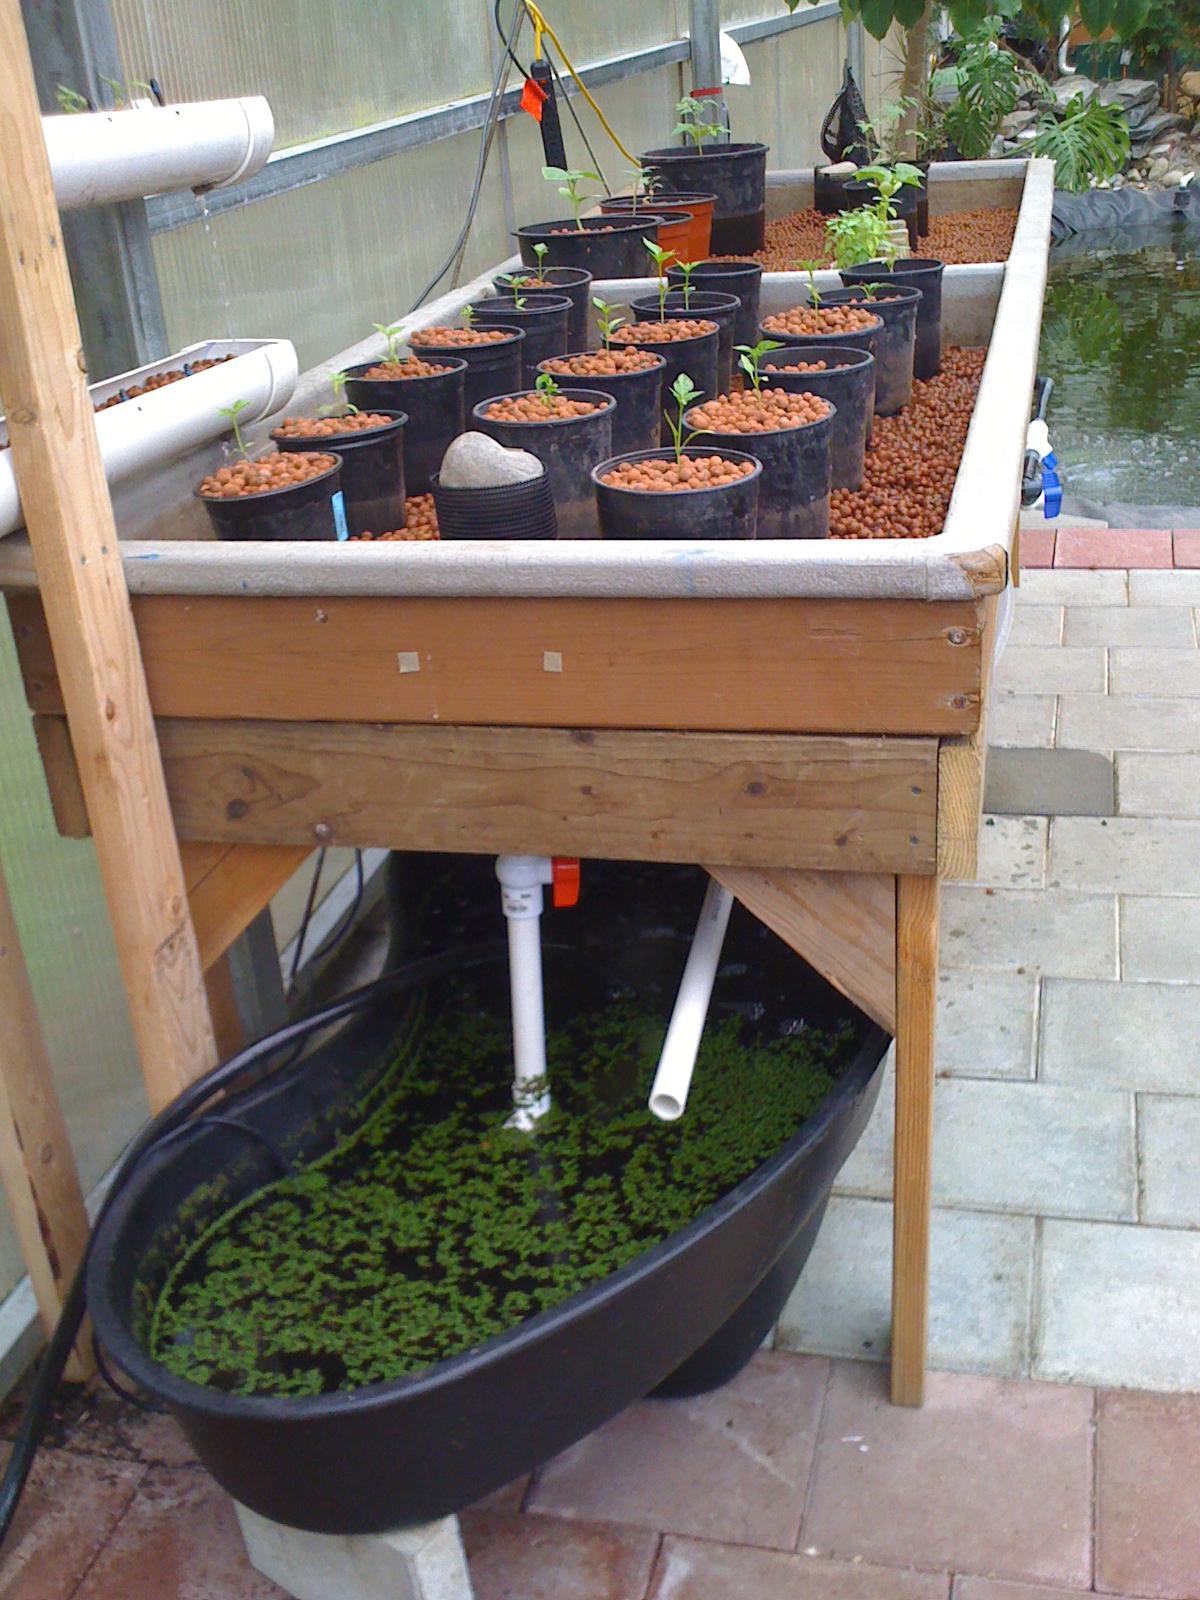 Hydroponics Blog  Healthier Food  New Aquaponics System